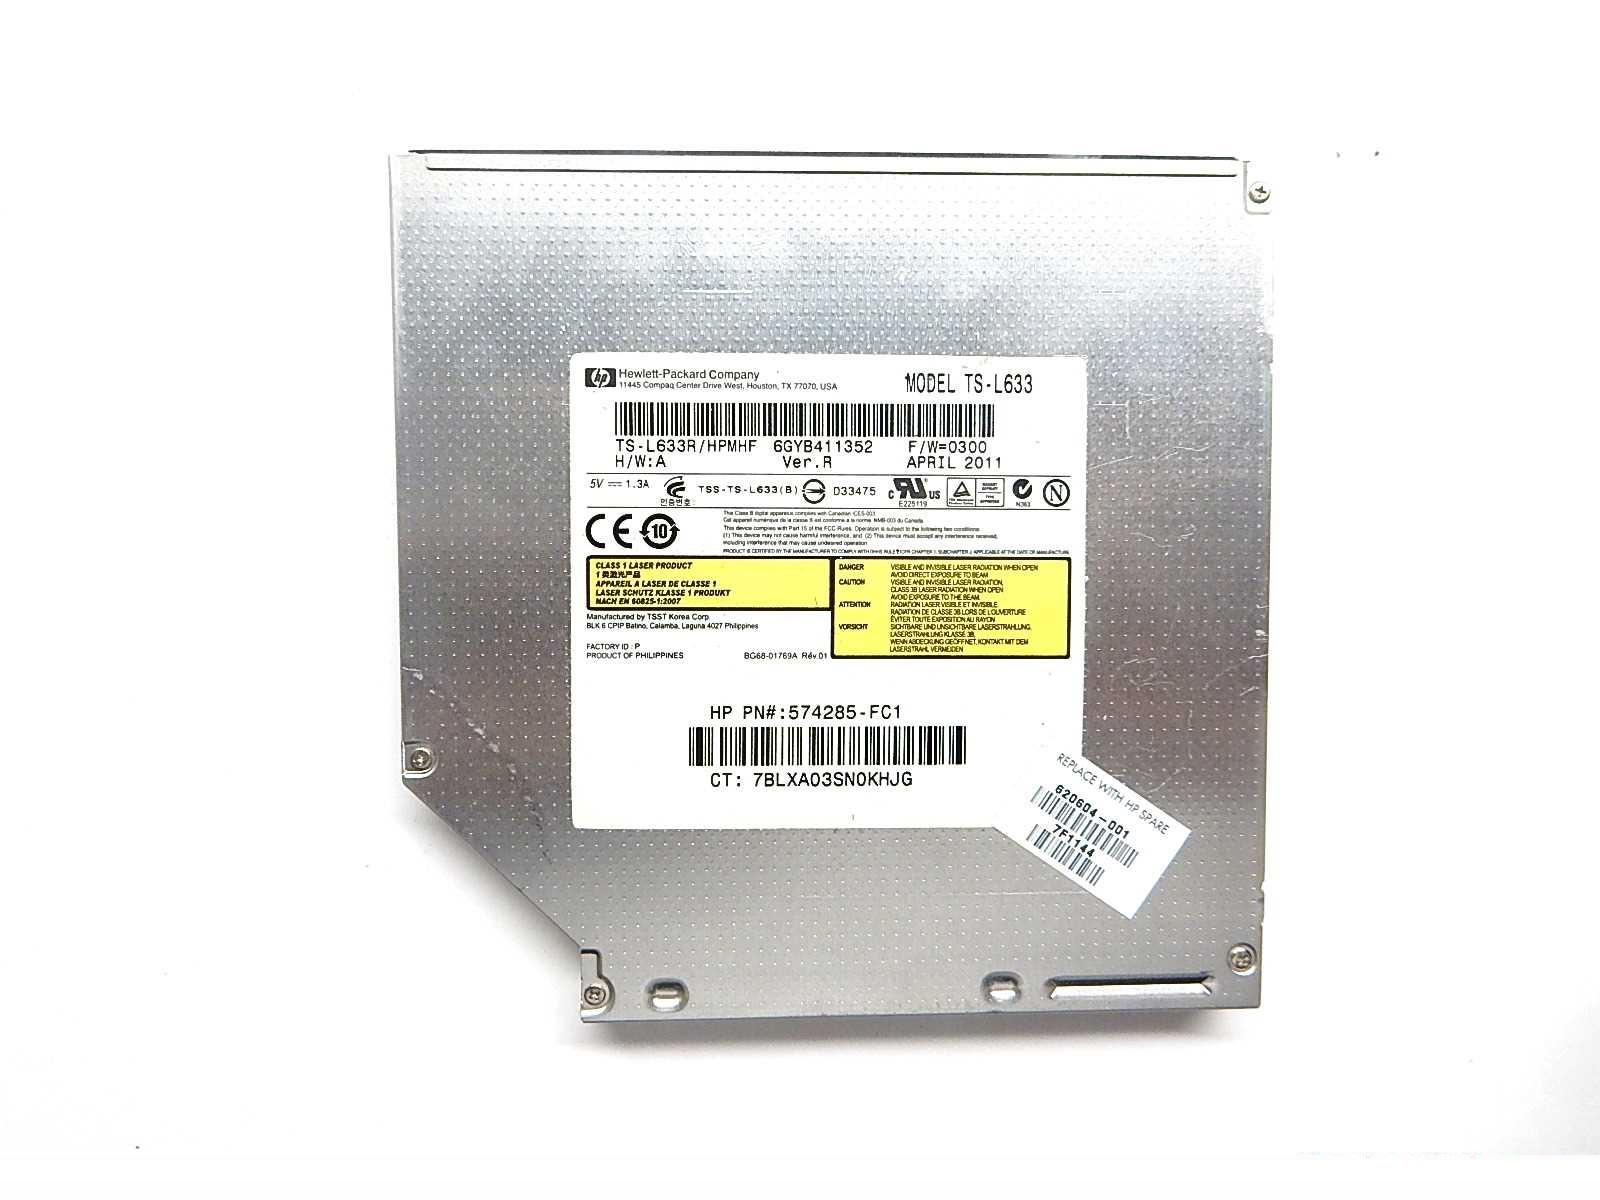 Купить Оптический привод DVD RW TS-L633, TS-L633R/HPMHF Hewlett